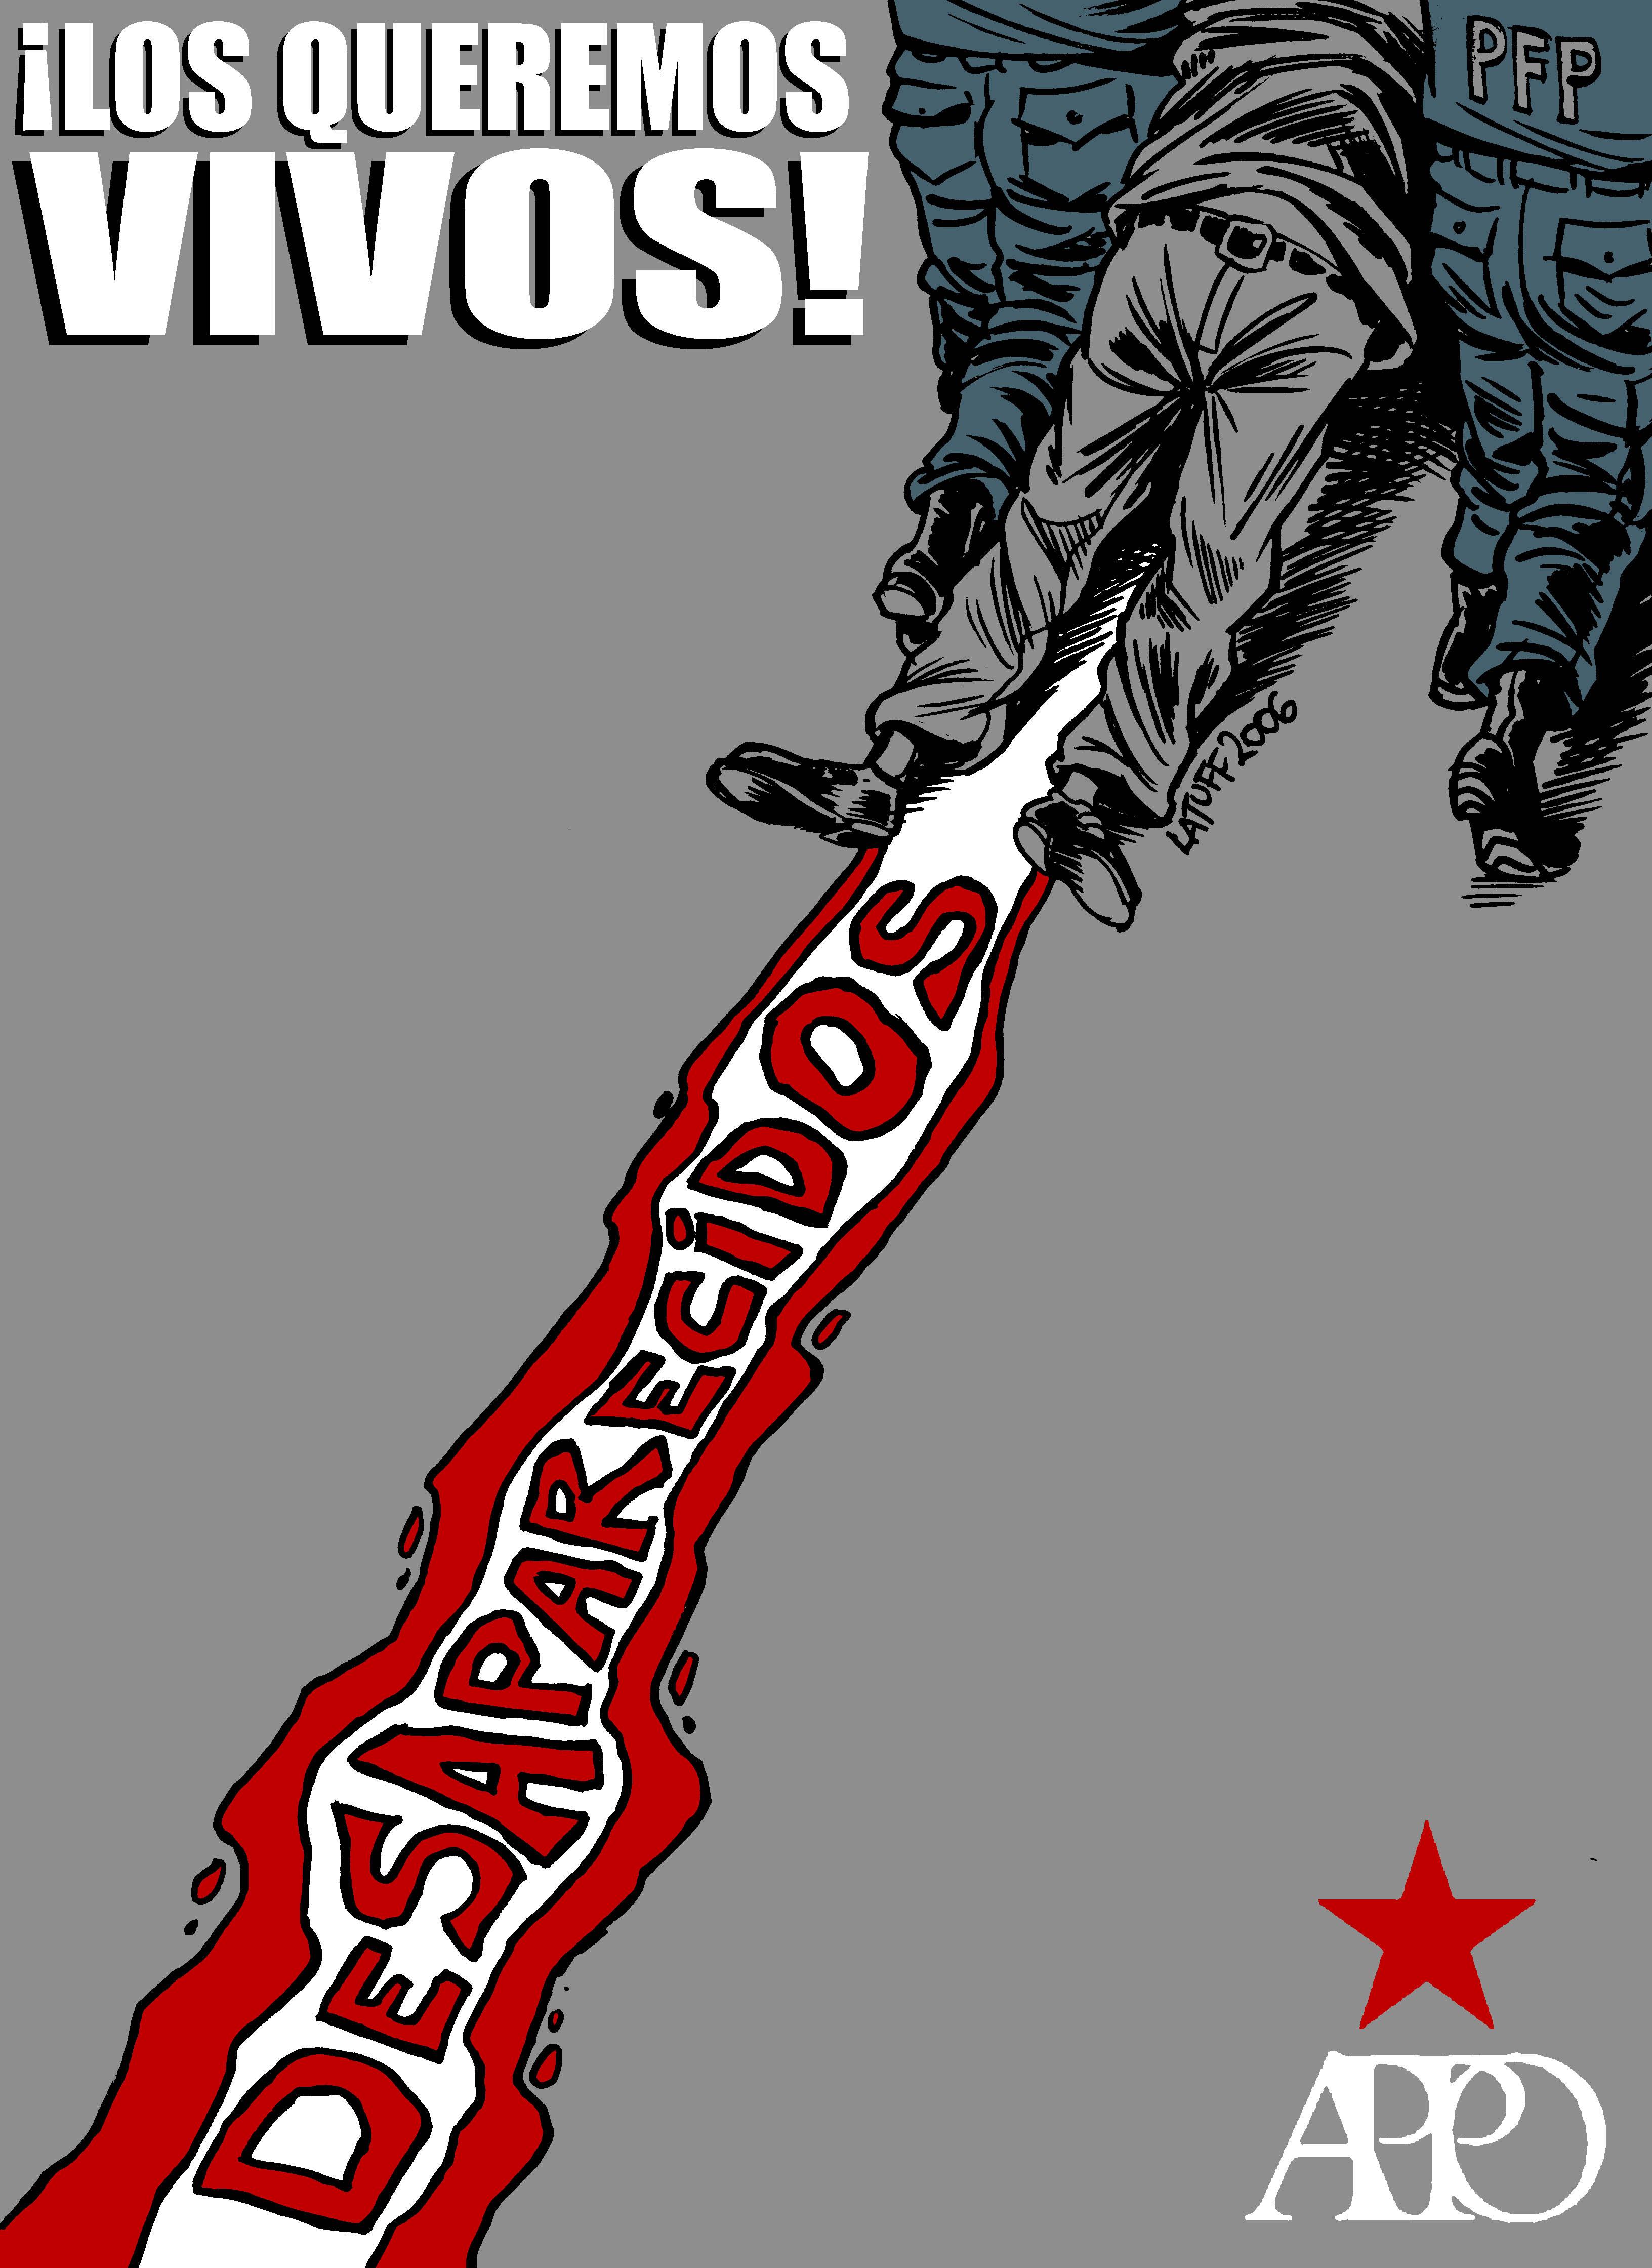 Desaparecidos by Latuff2 on DeviantArt